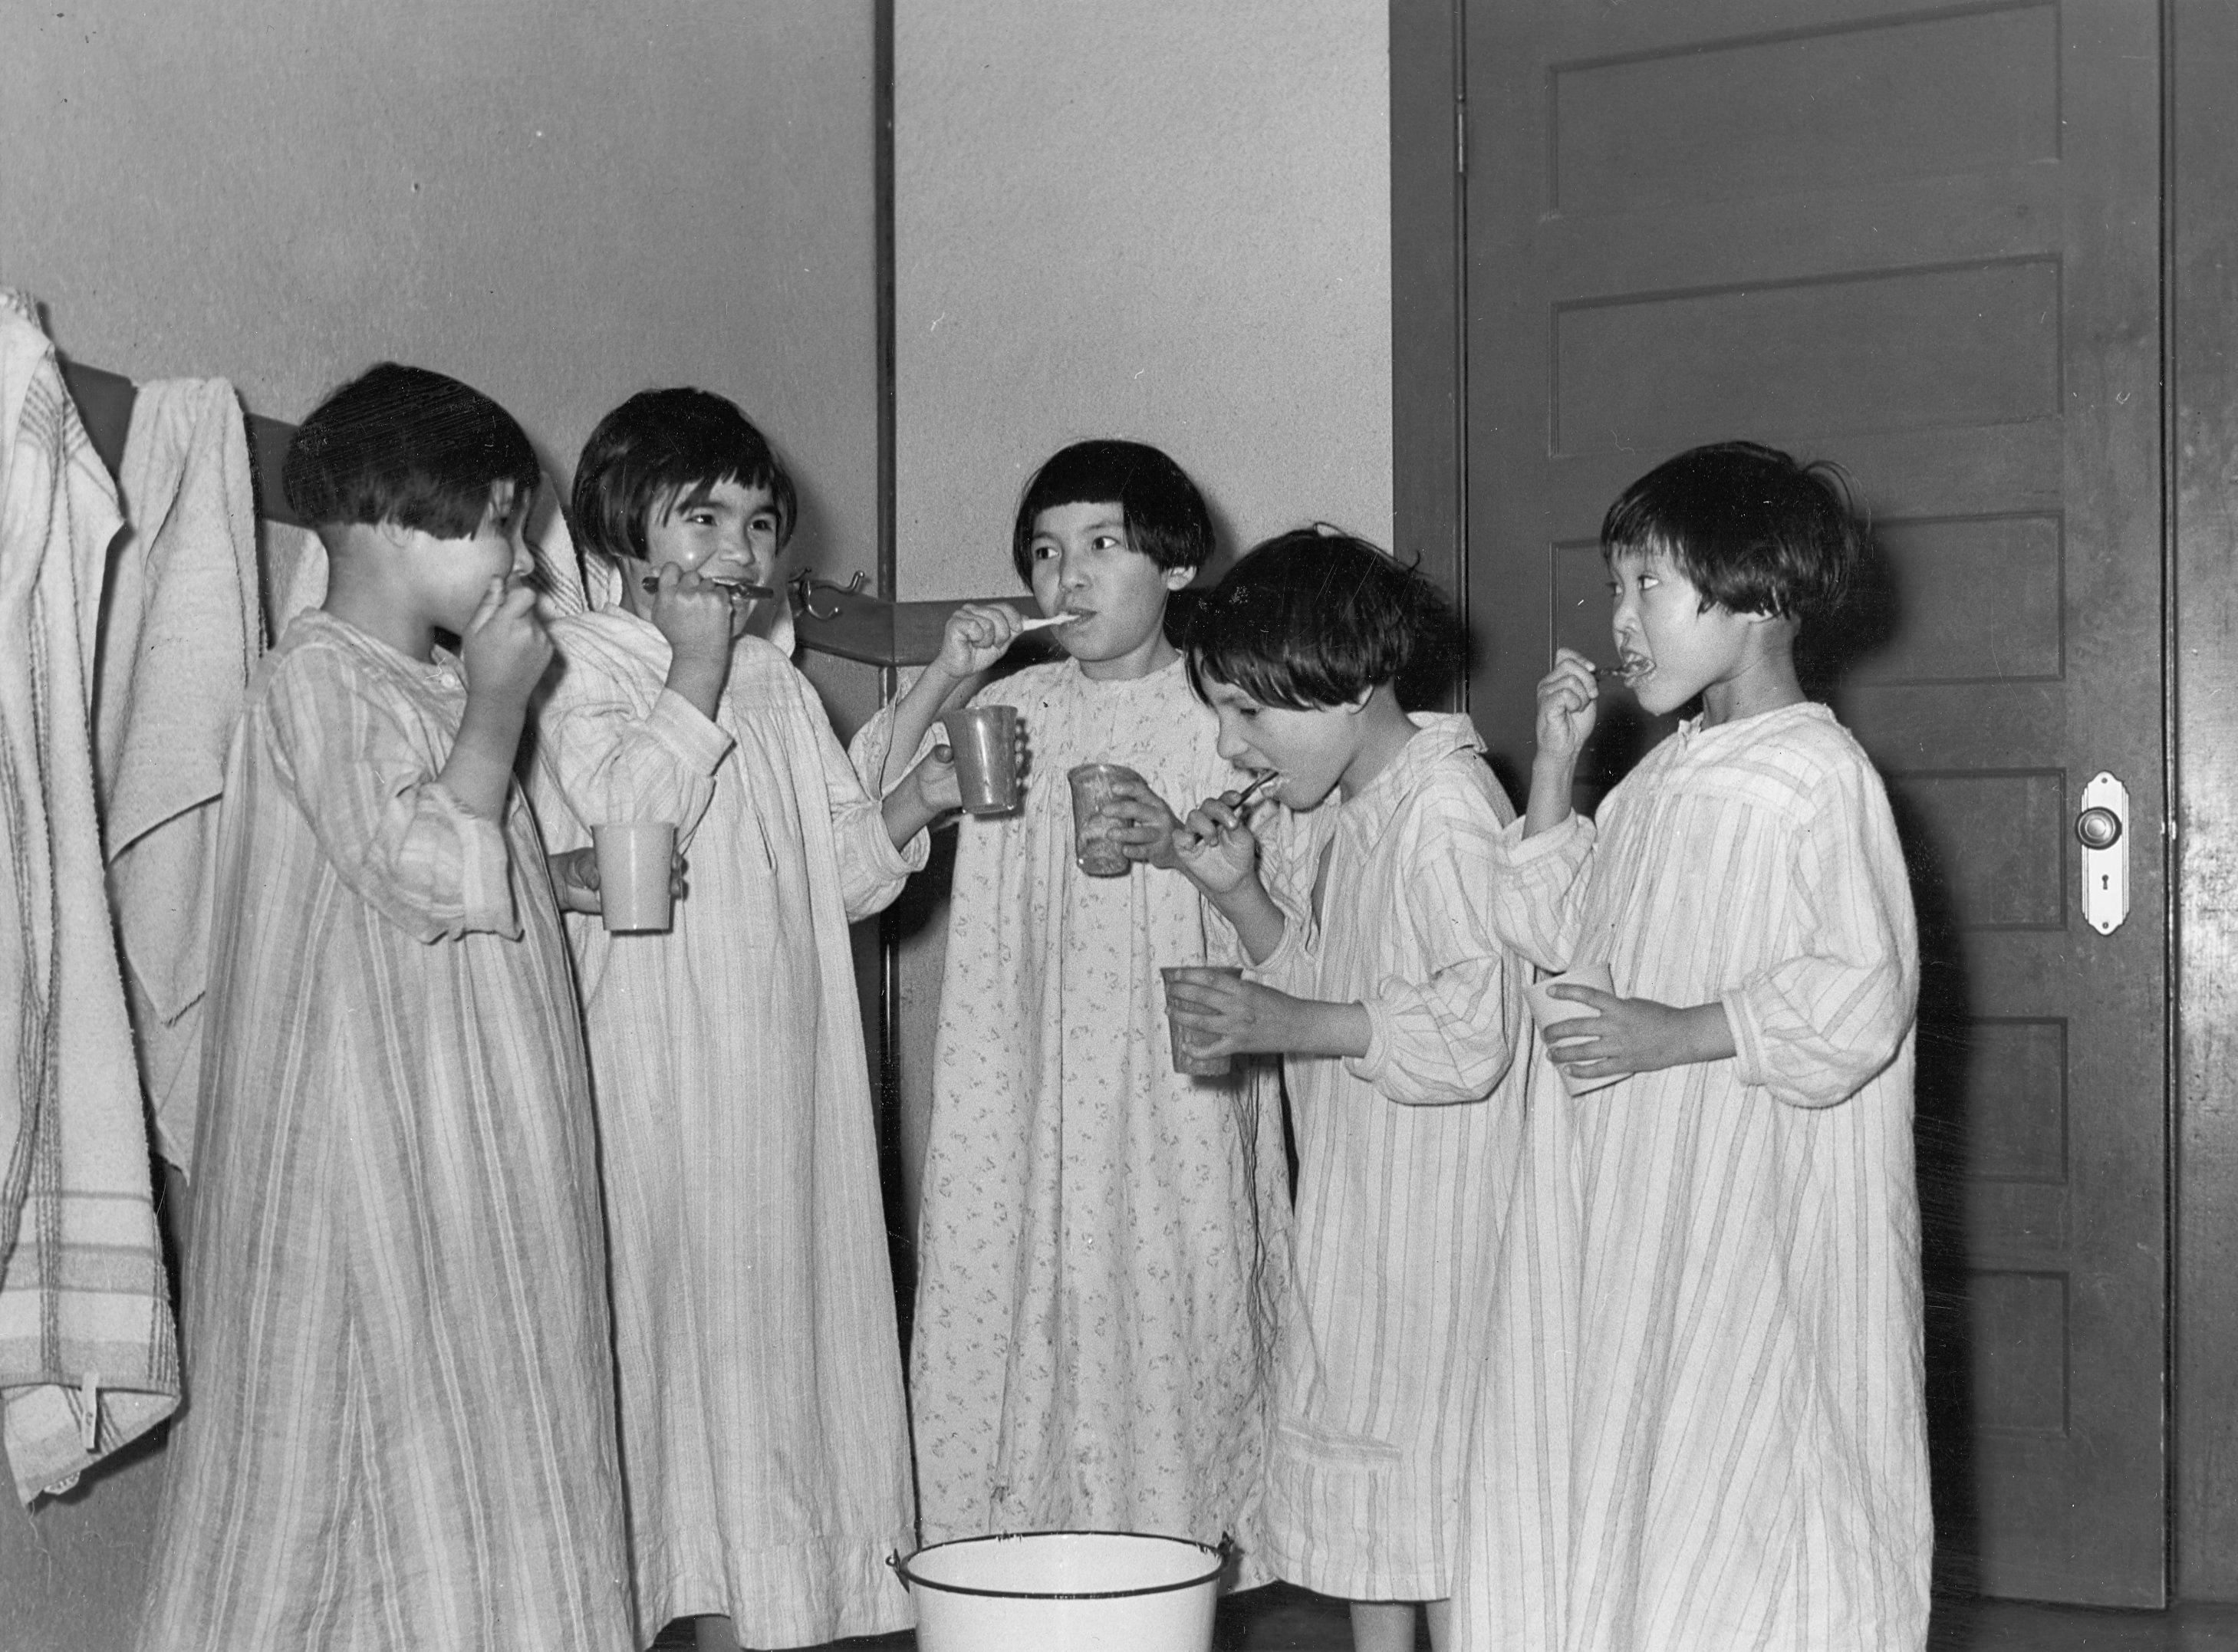 Black and white photo of girls brushing their teeth.